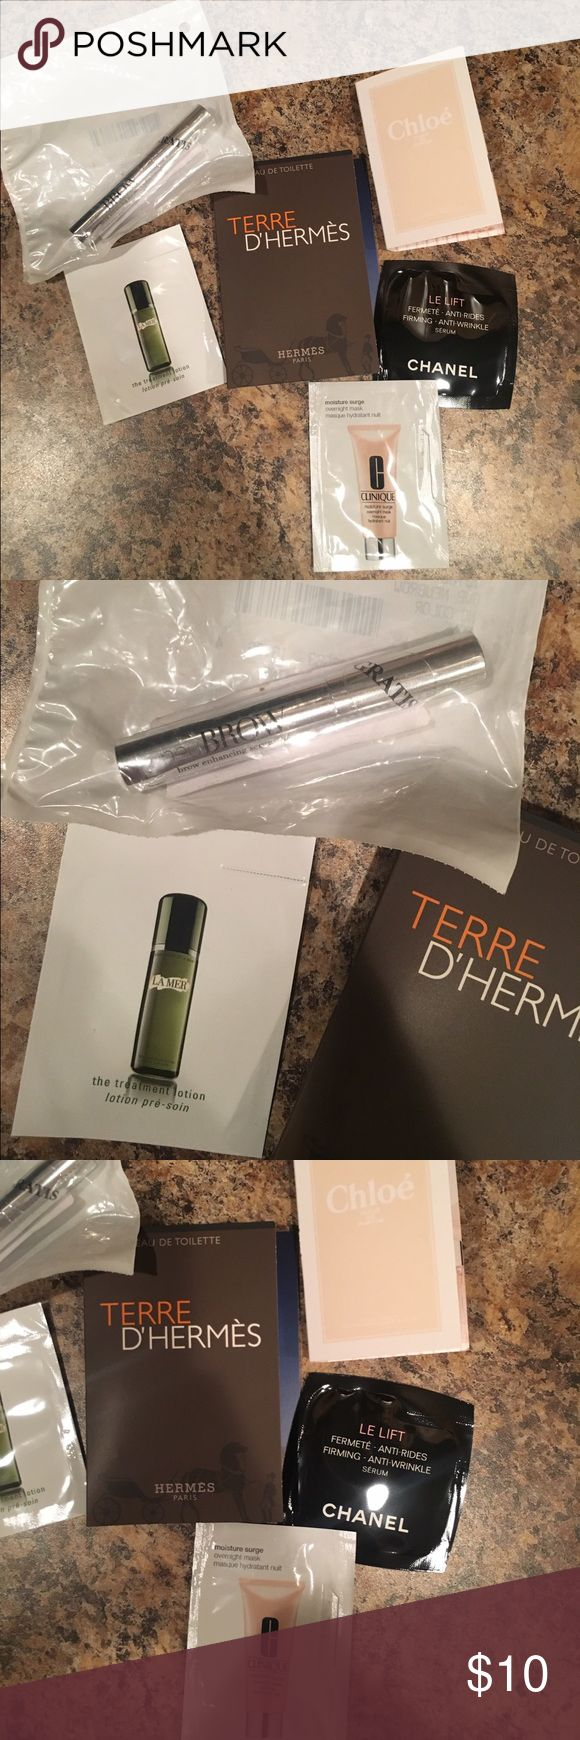 Makeup Sample Bundle Makeup sample bundle, includes Hermes perfume, Chloe perfume, Chanel serum, Clinique moisturizer, Neubrow sample, and La Mer moisturizer. Makeup